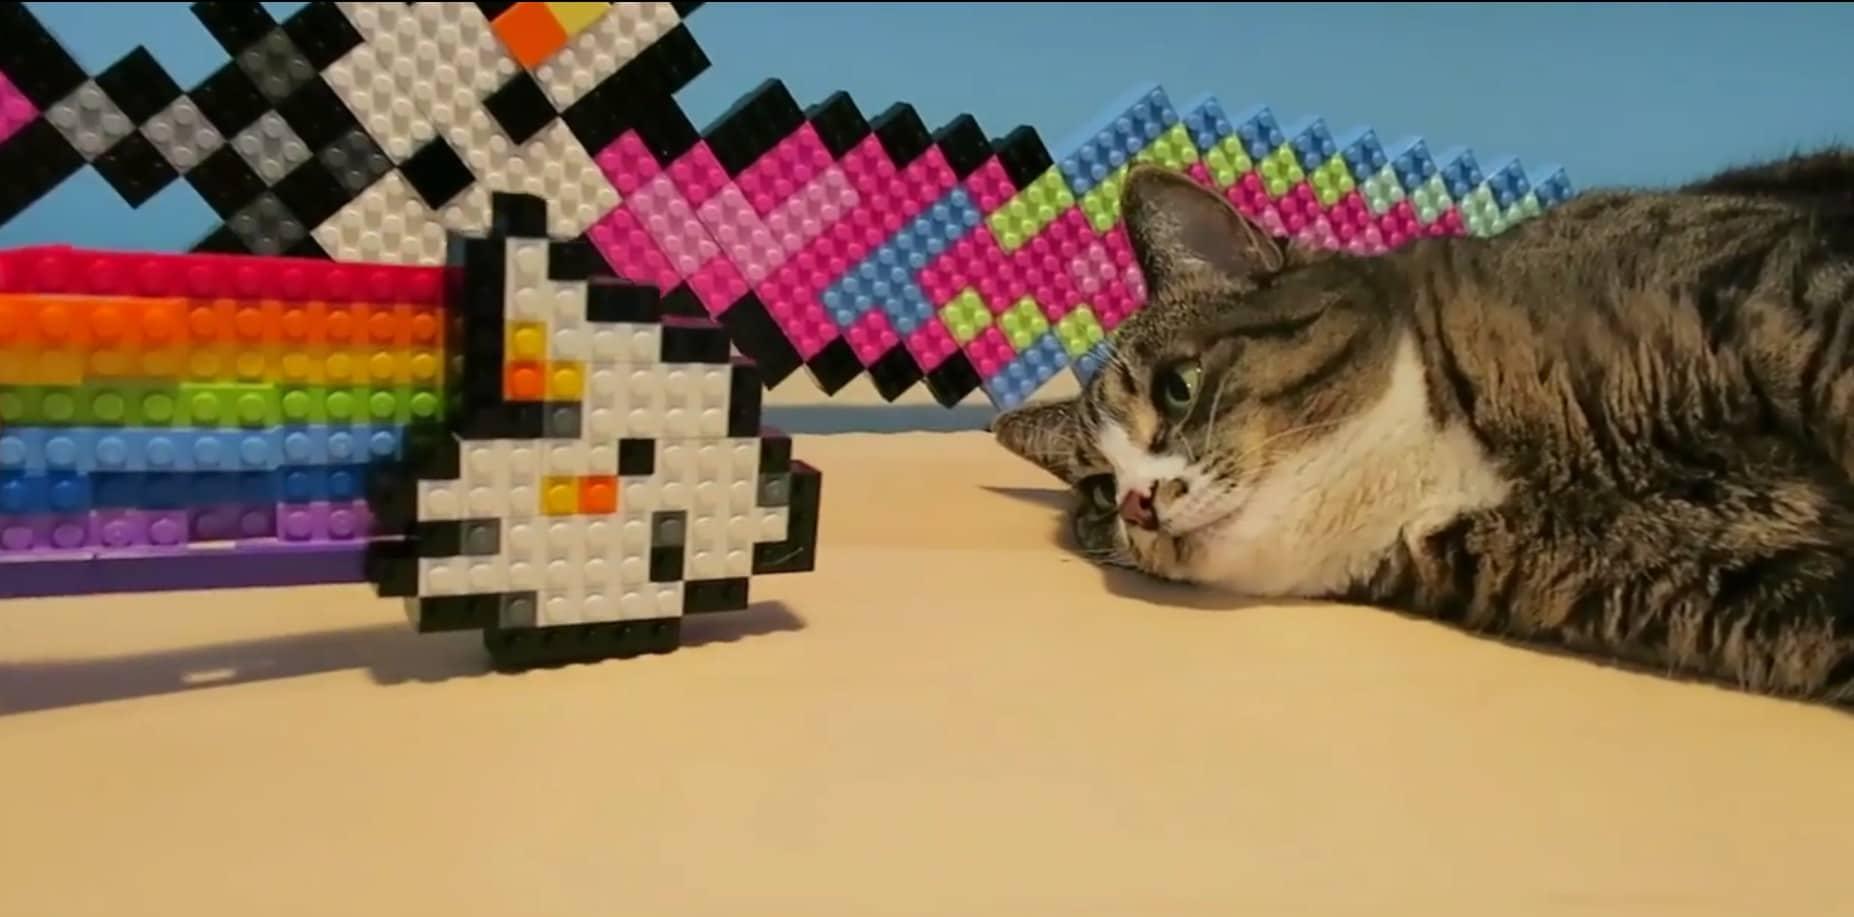 Süß. Das LEGO-Zeugs auch. (Foto: Screenshot)